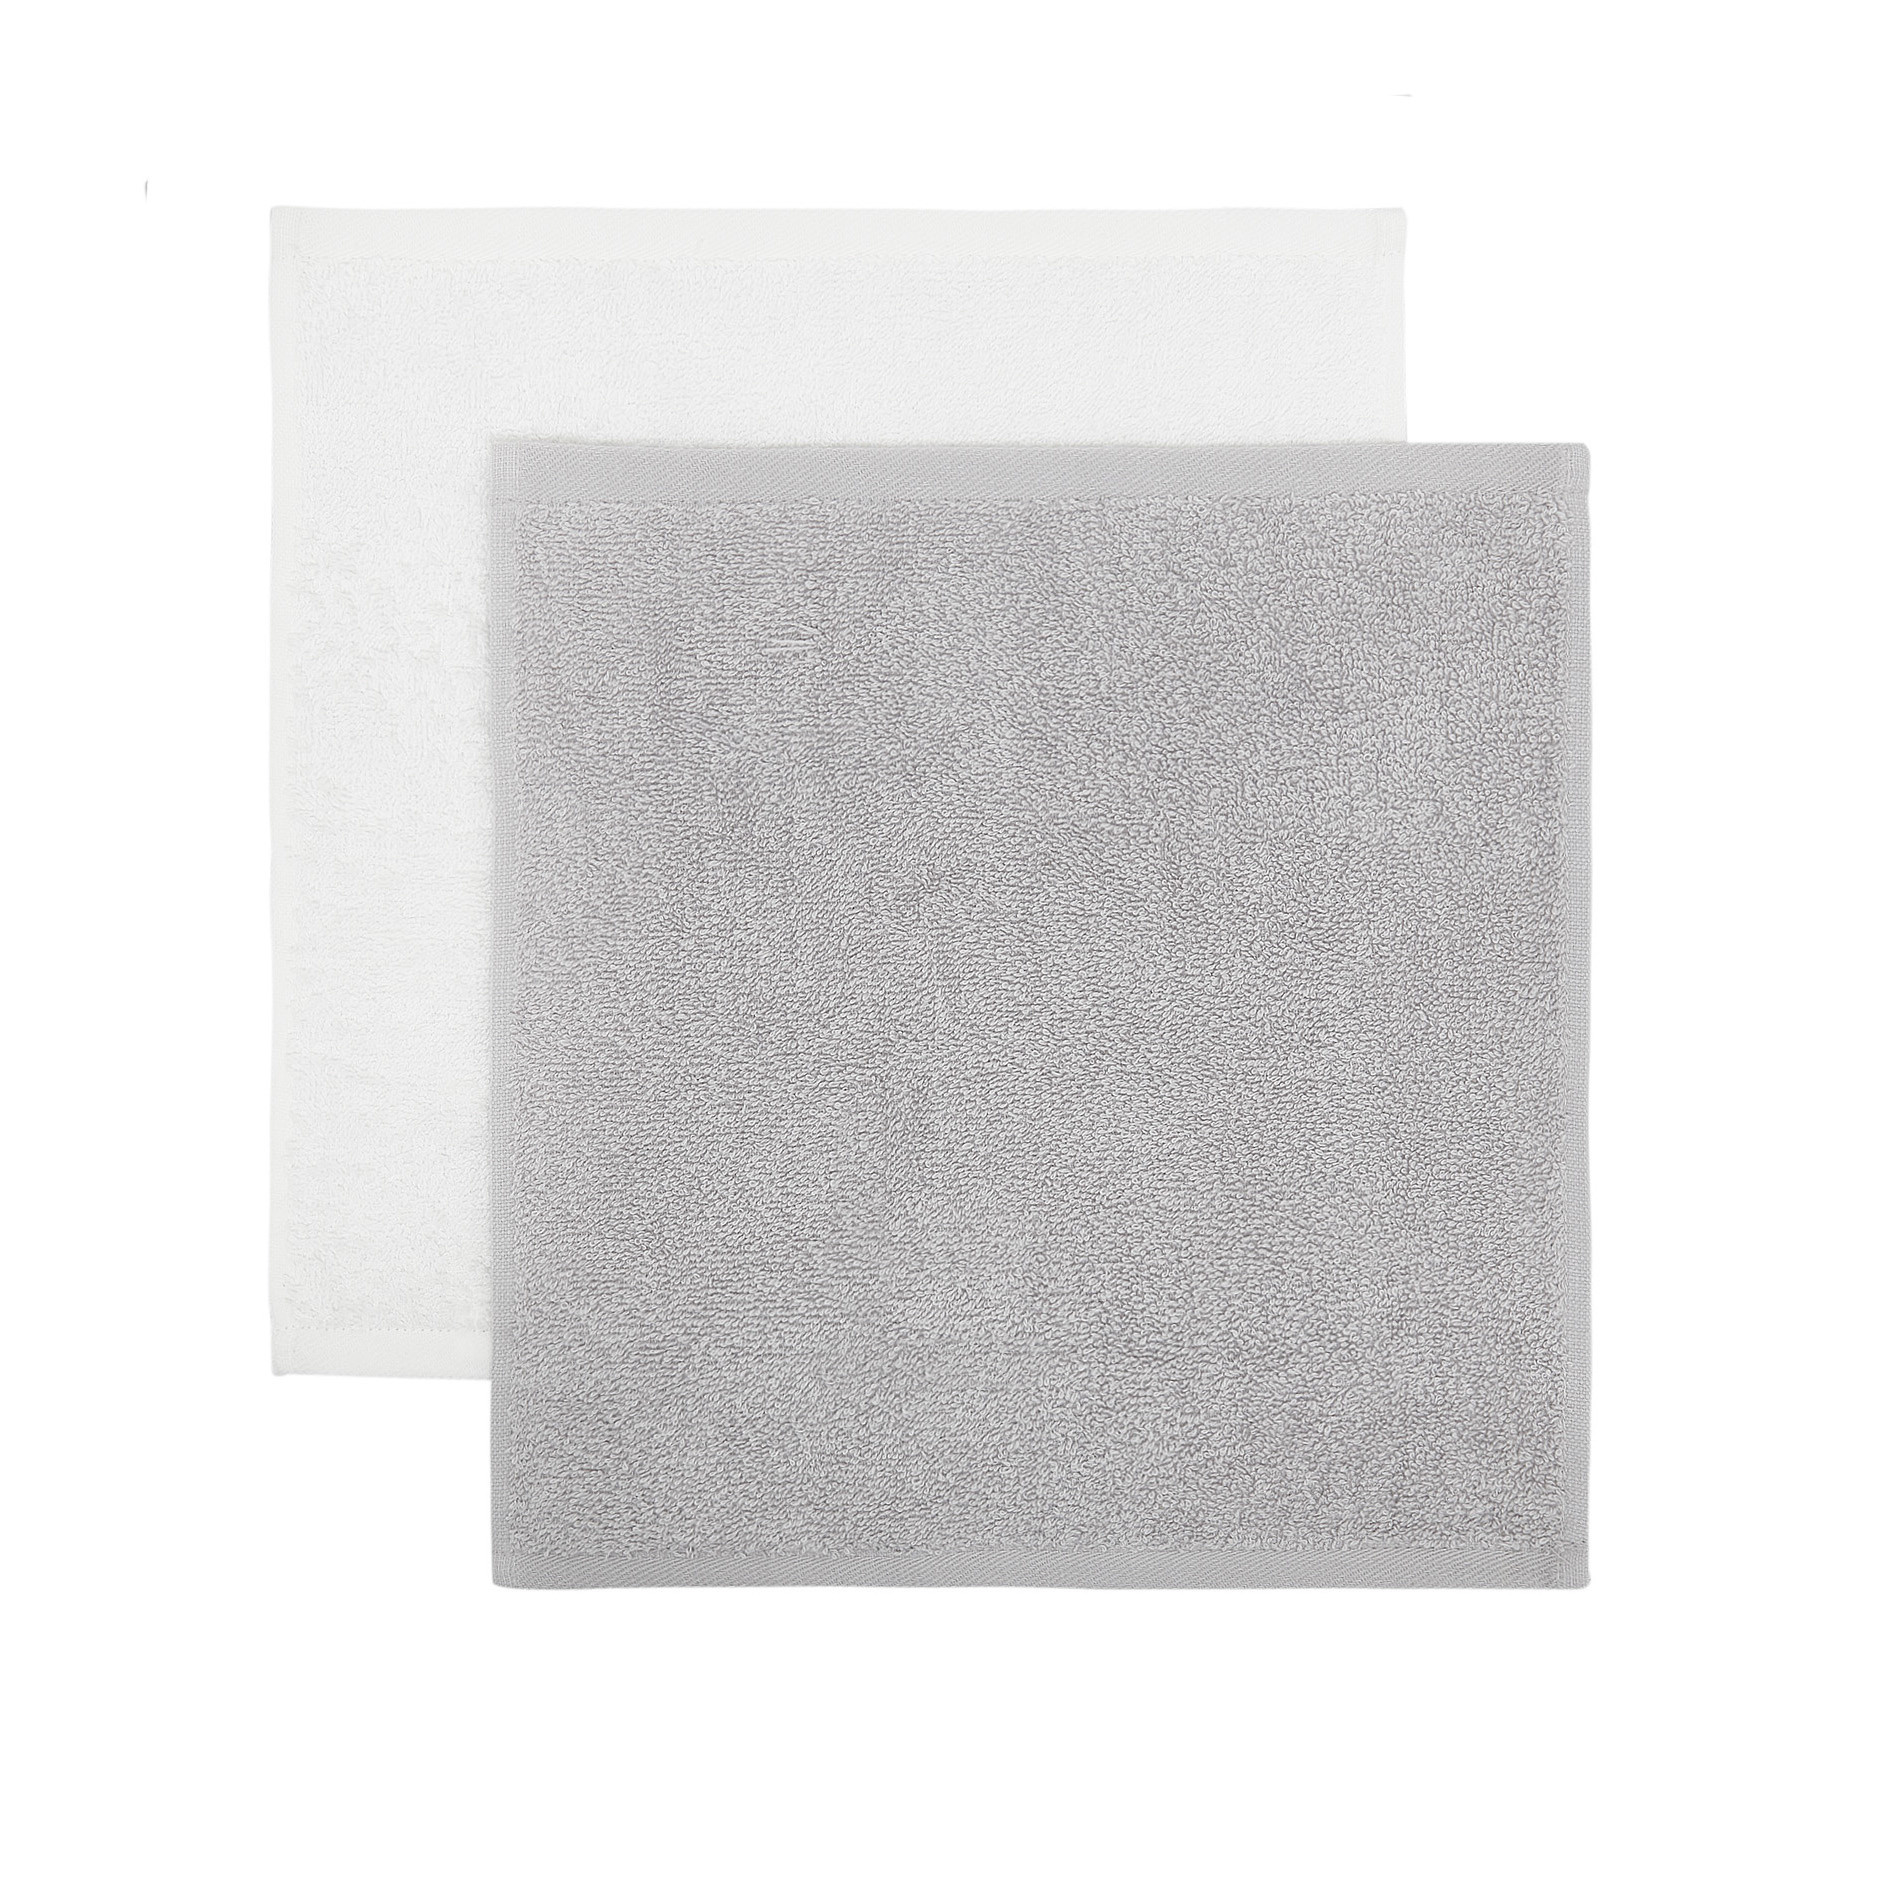 Cestino 4 lavette spugna di cotone, Grigio, large image number 1